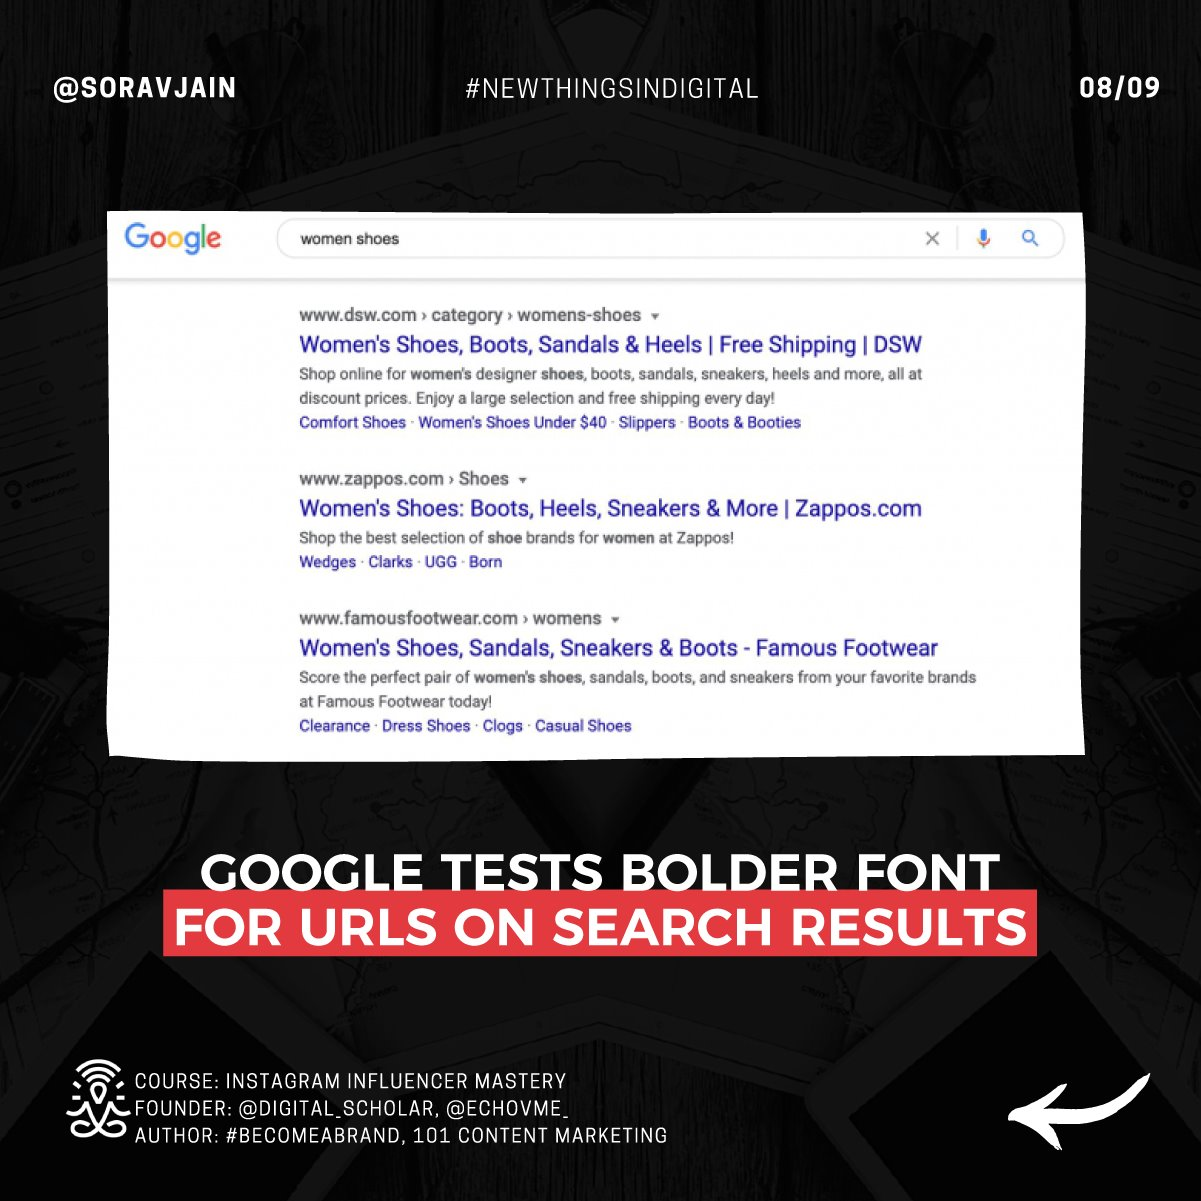 Google tests bolder font for URLs on Search results